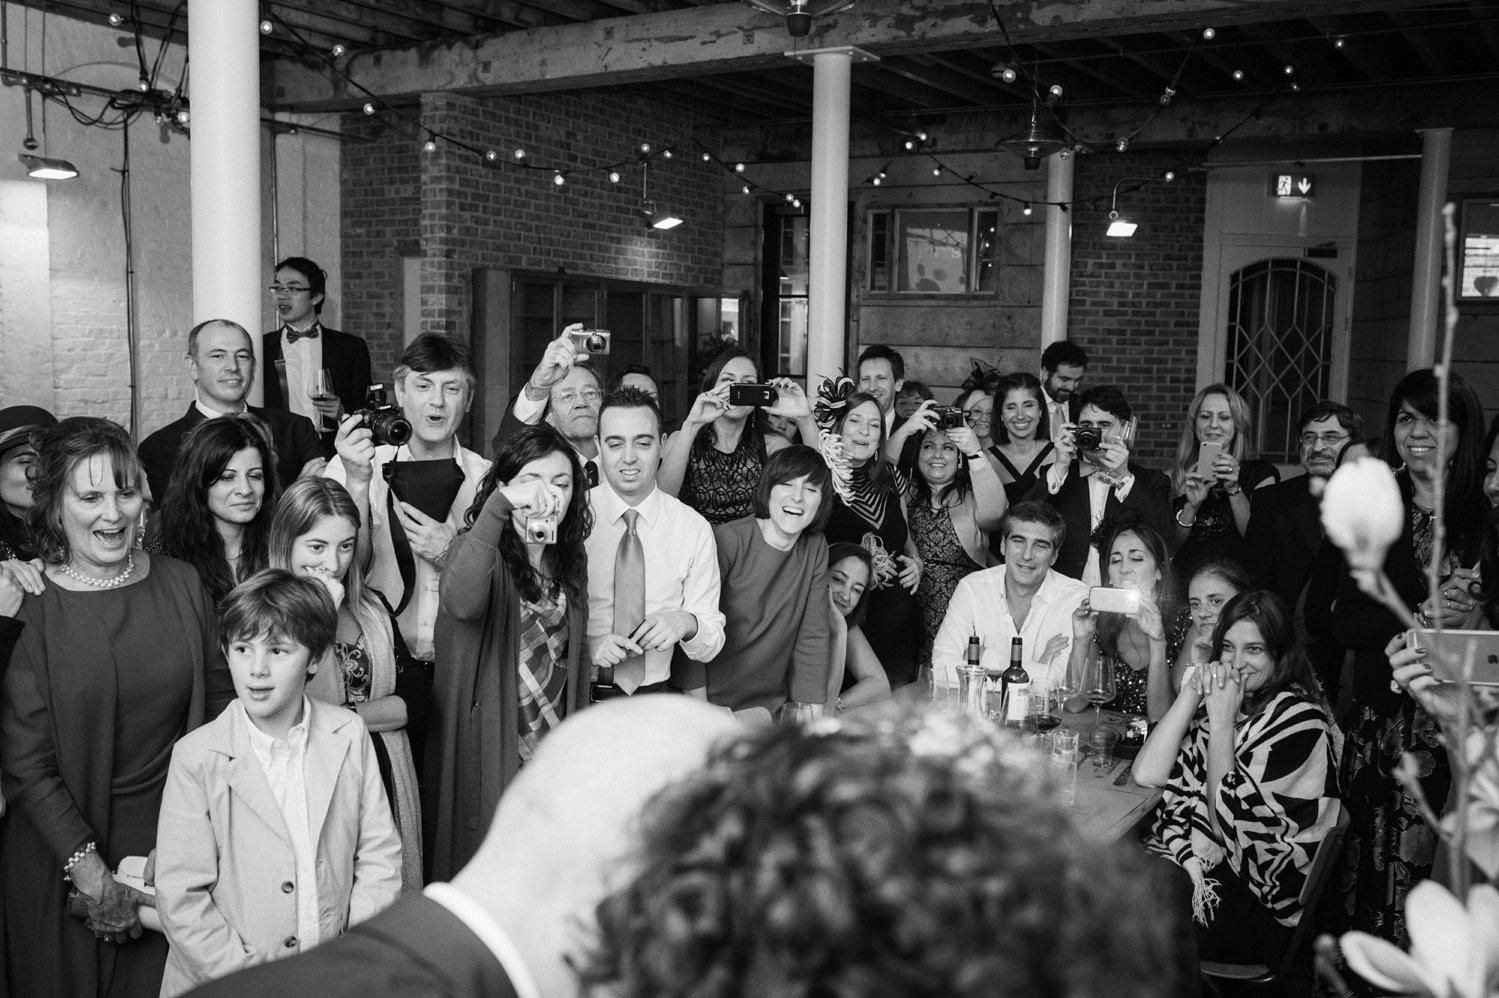 brixton east wedding photographer-42